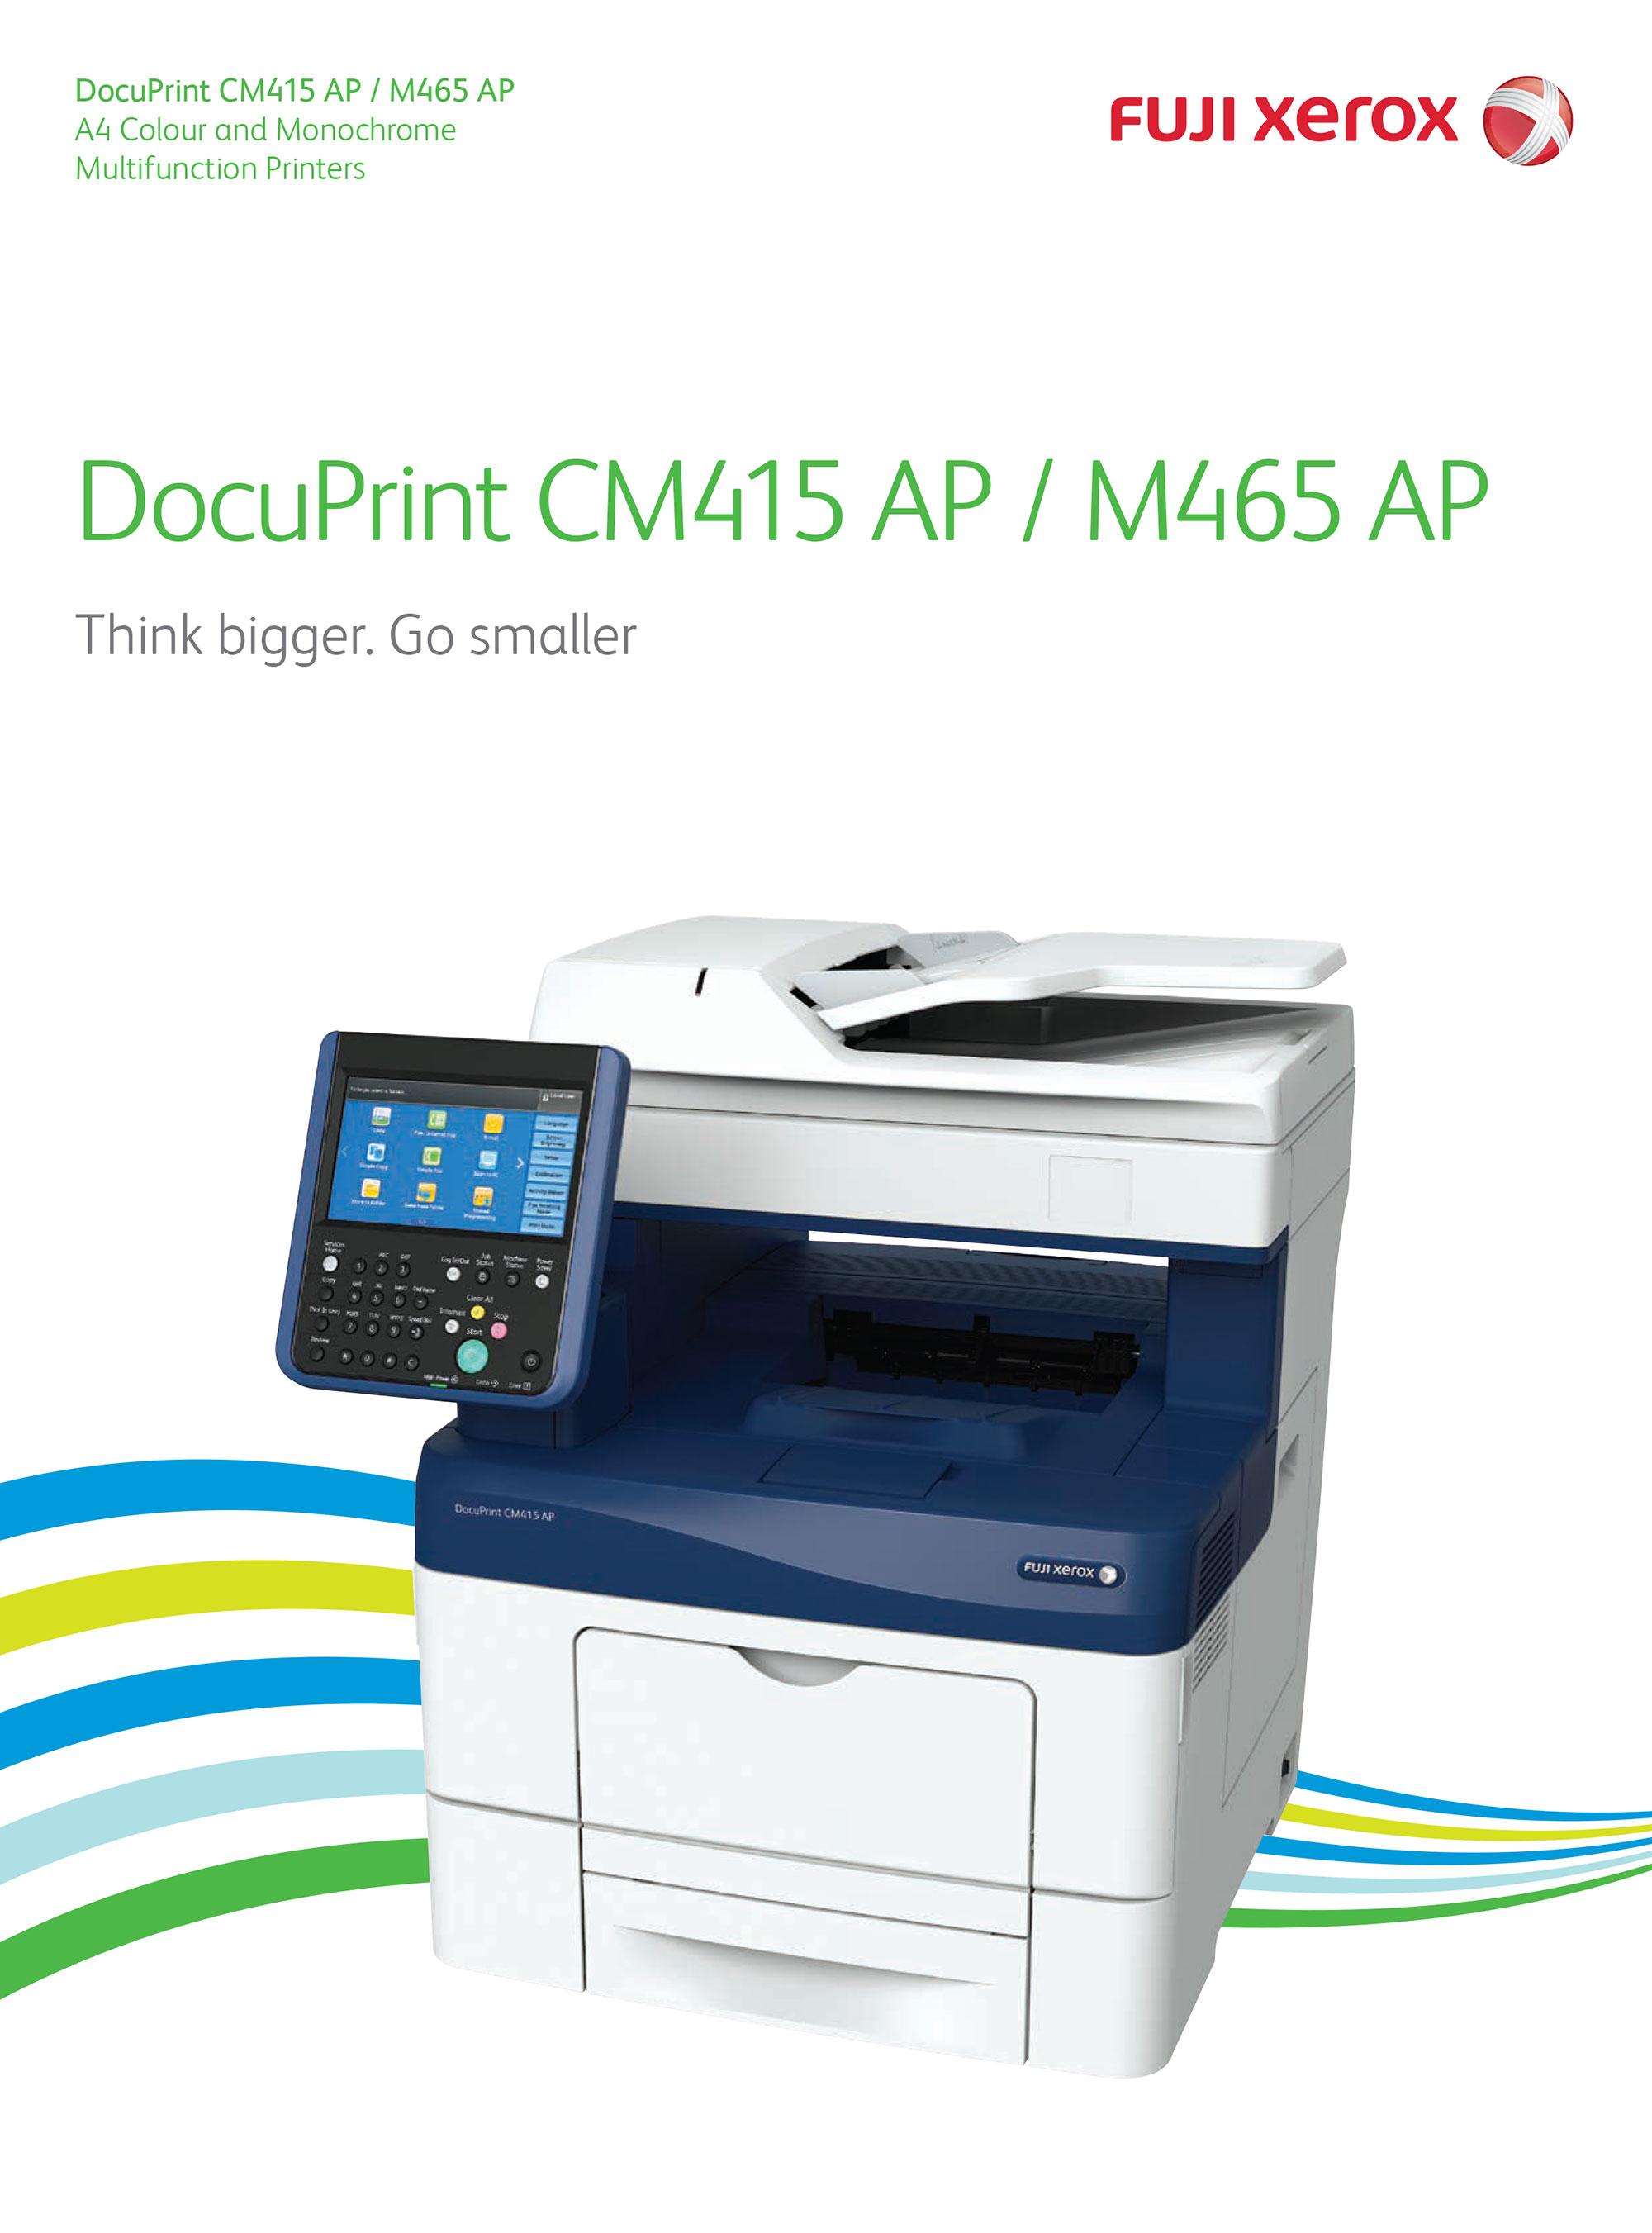 Fuji Xerox DocuPrint M465 AP